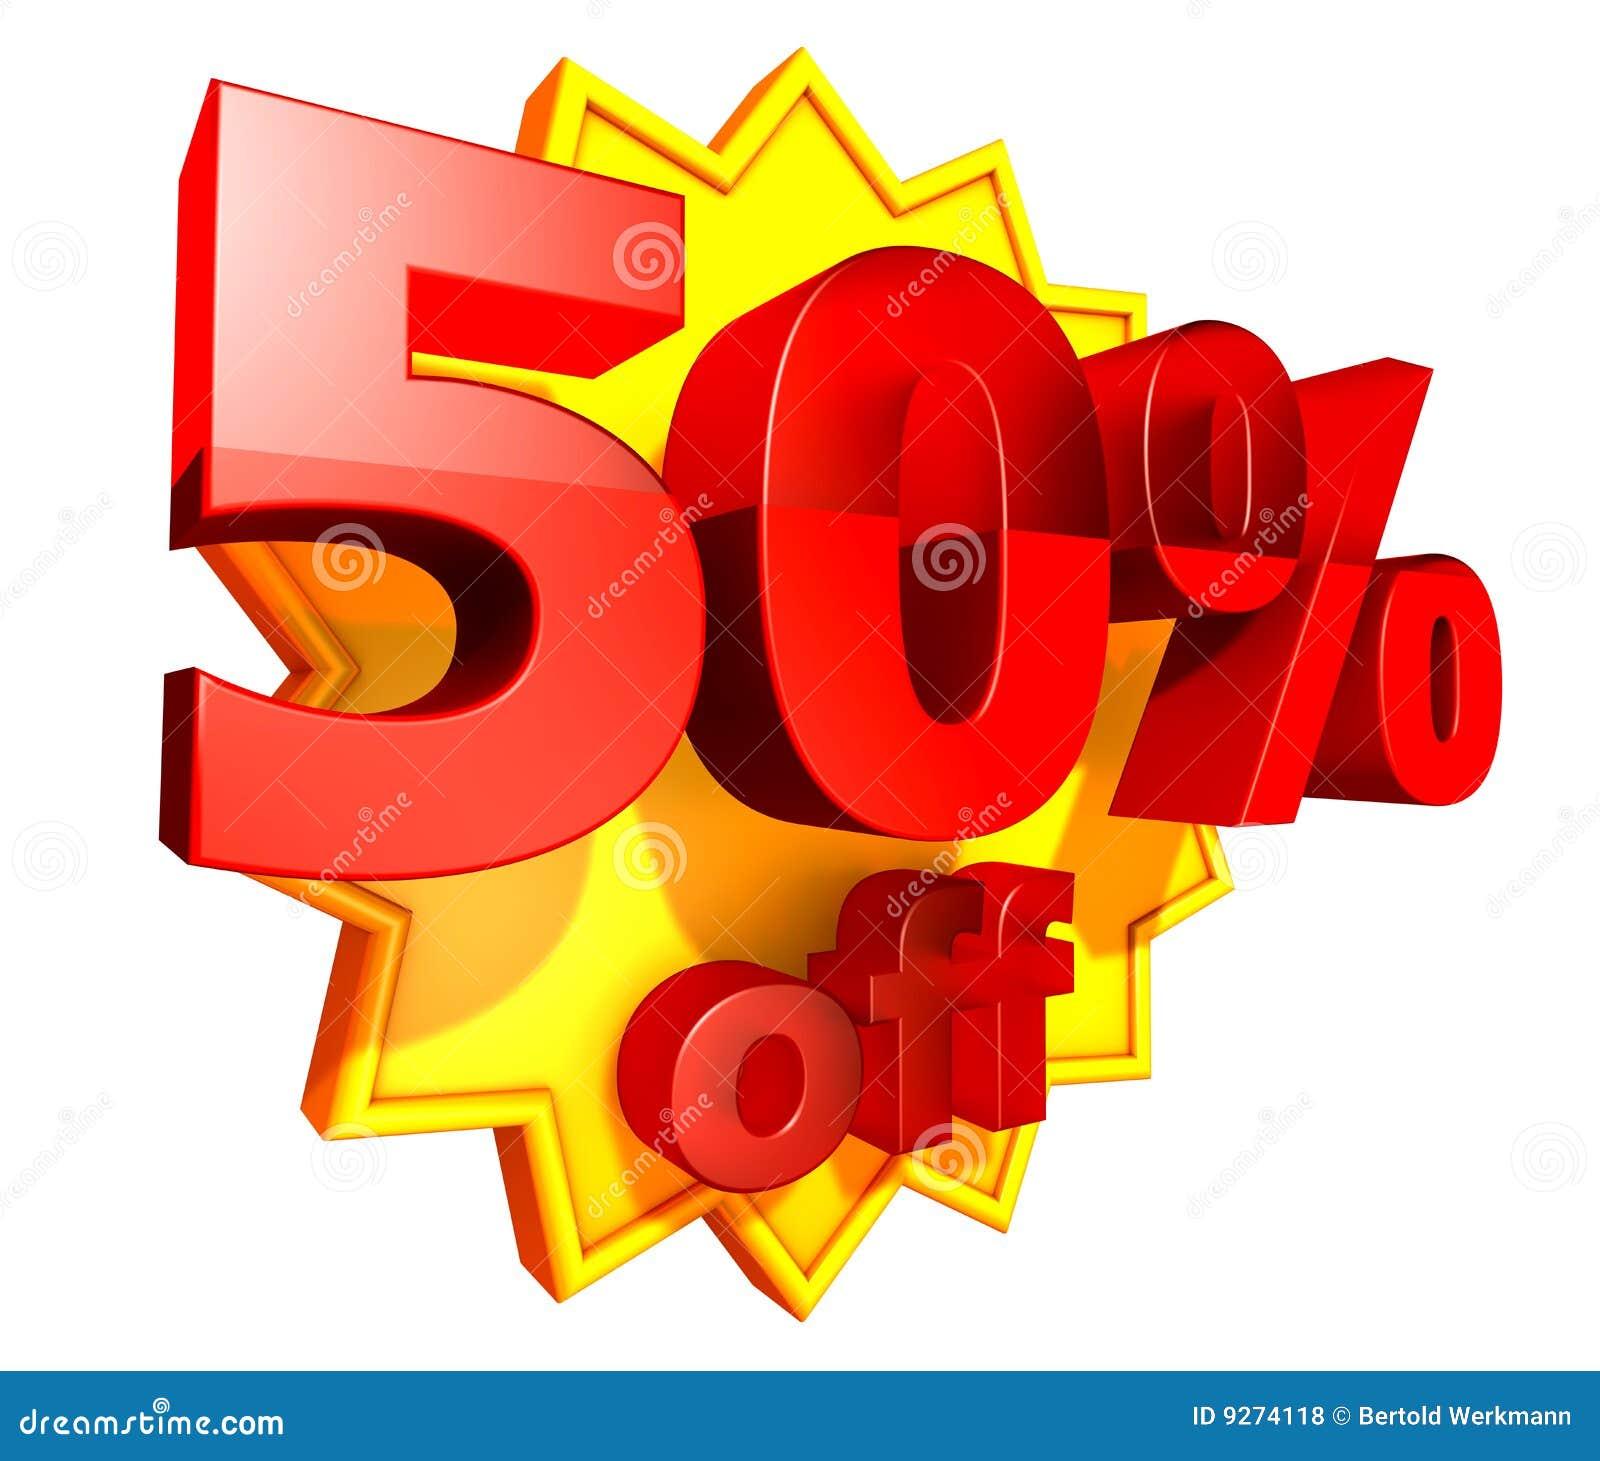 50 percent price off discount